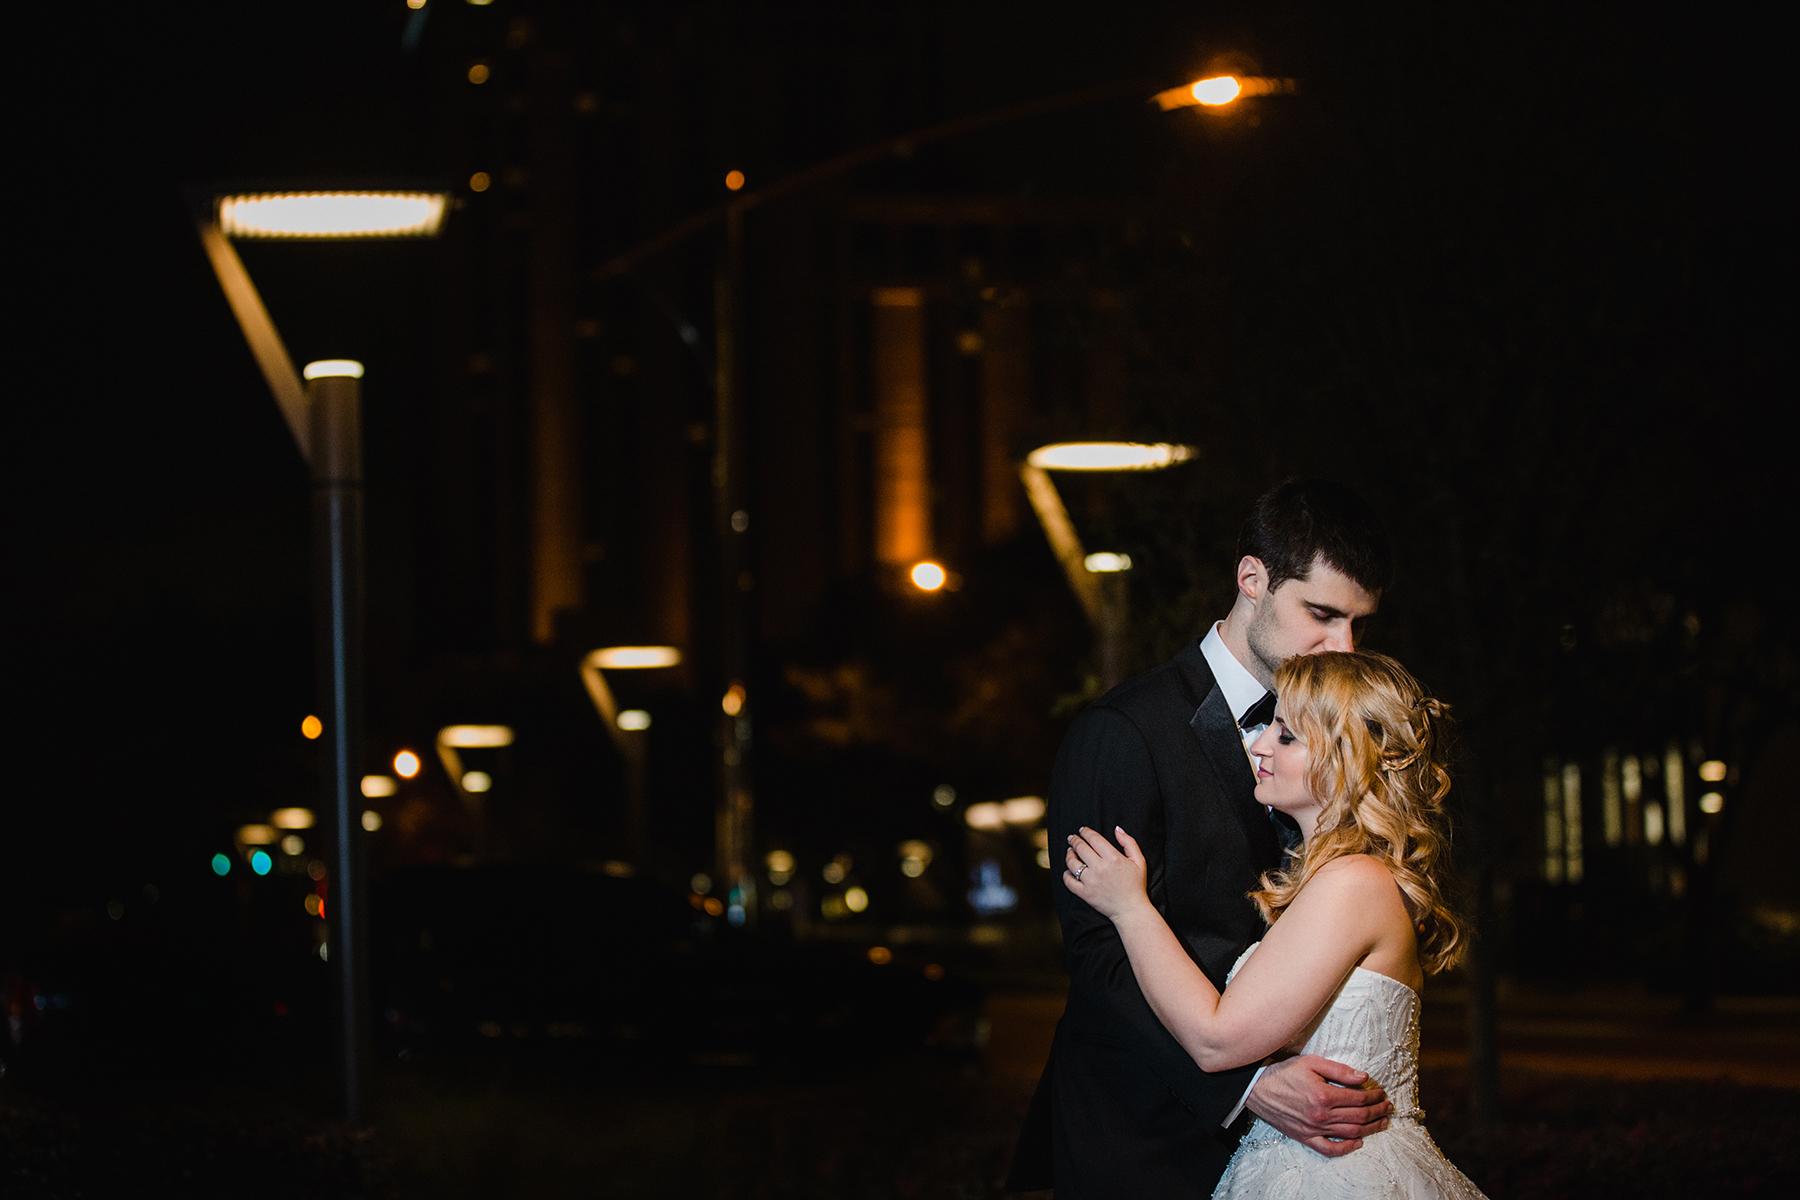 daytoremember.net | Eri Reyna Photography | Hyatt Regency Galleria | Houston, Texas | A Day To Remember Houston Luxury Wedding Planning and Design